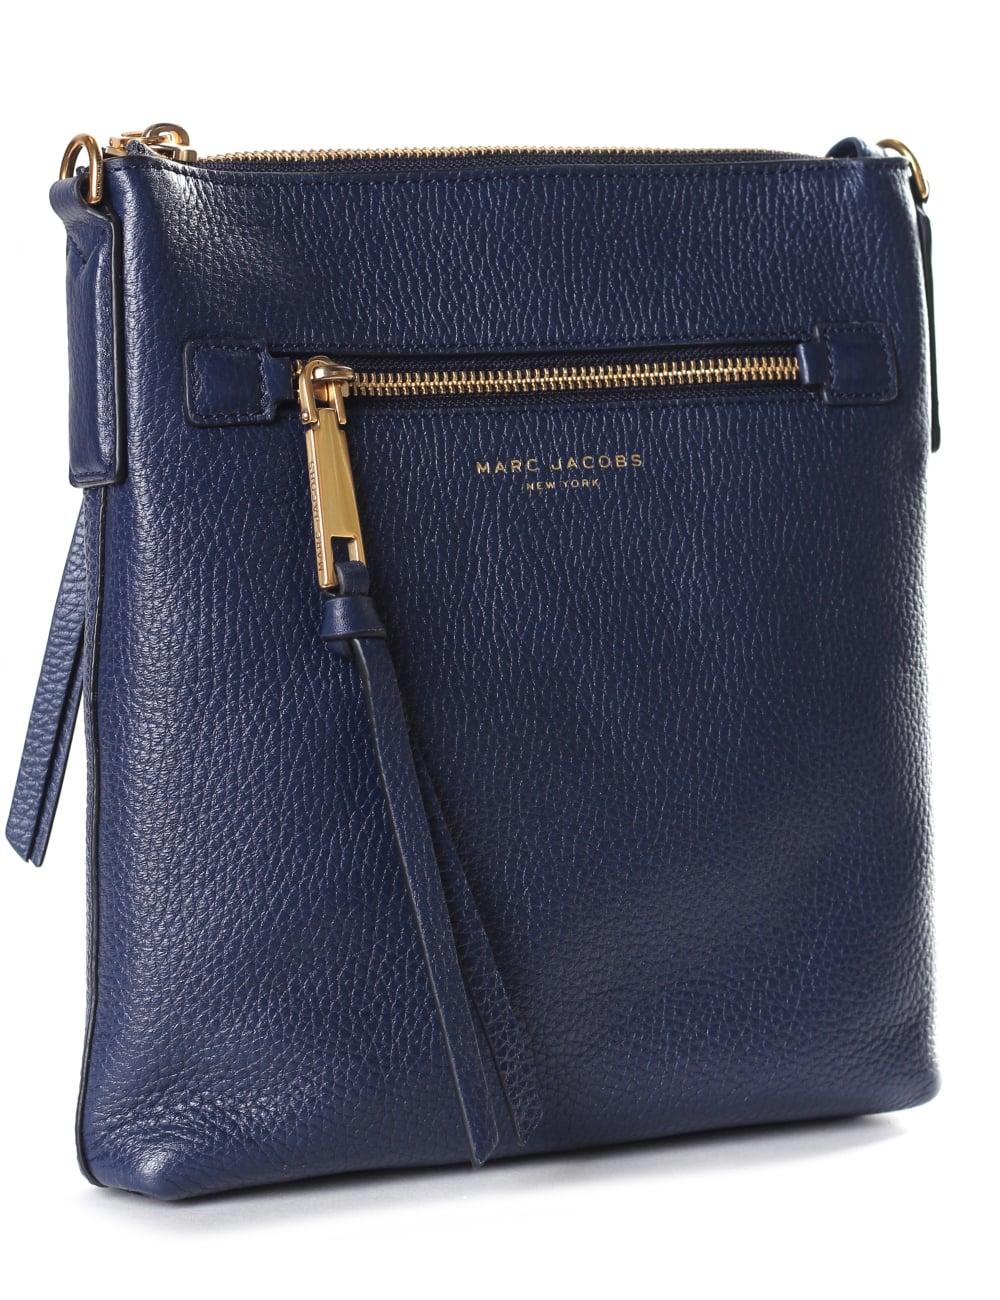 89c4ac91db Marc Jacobs Recruit Women's North South Crossbody Bag